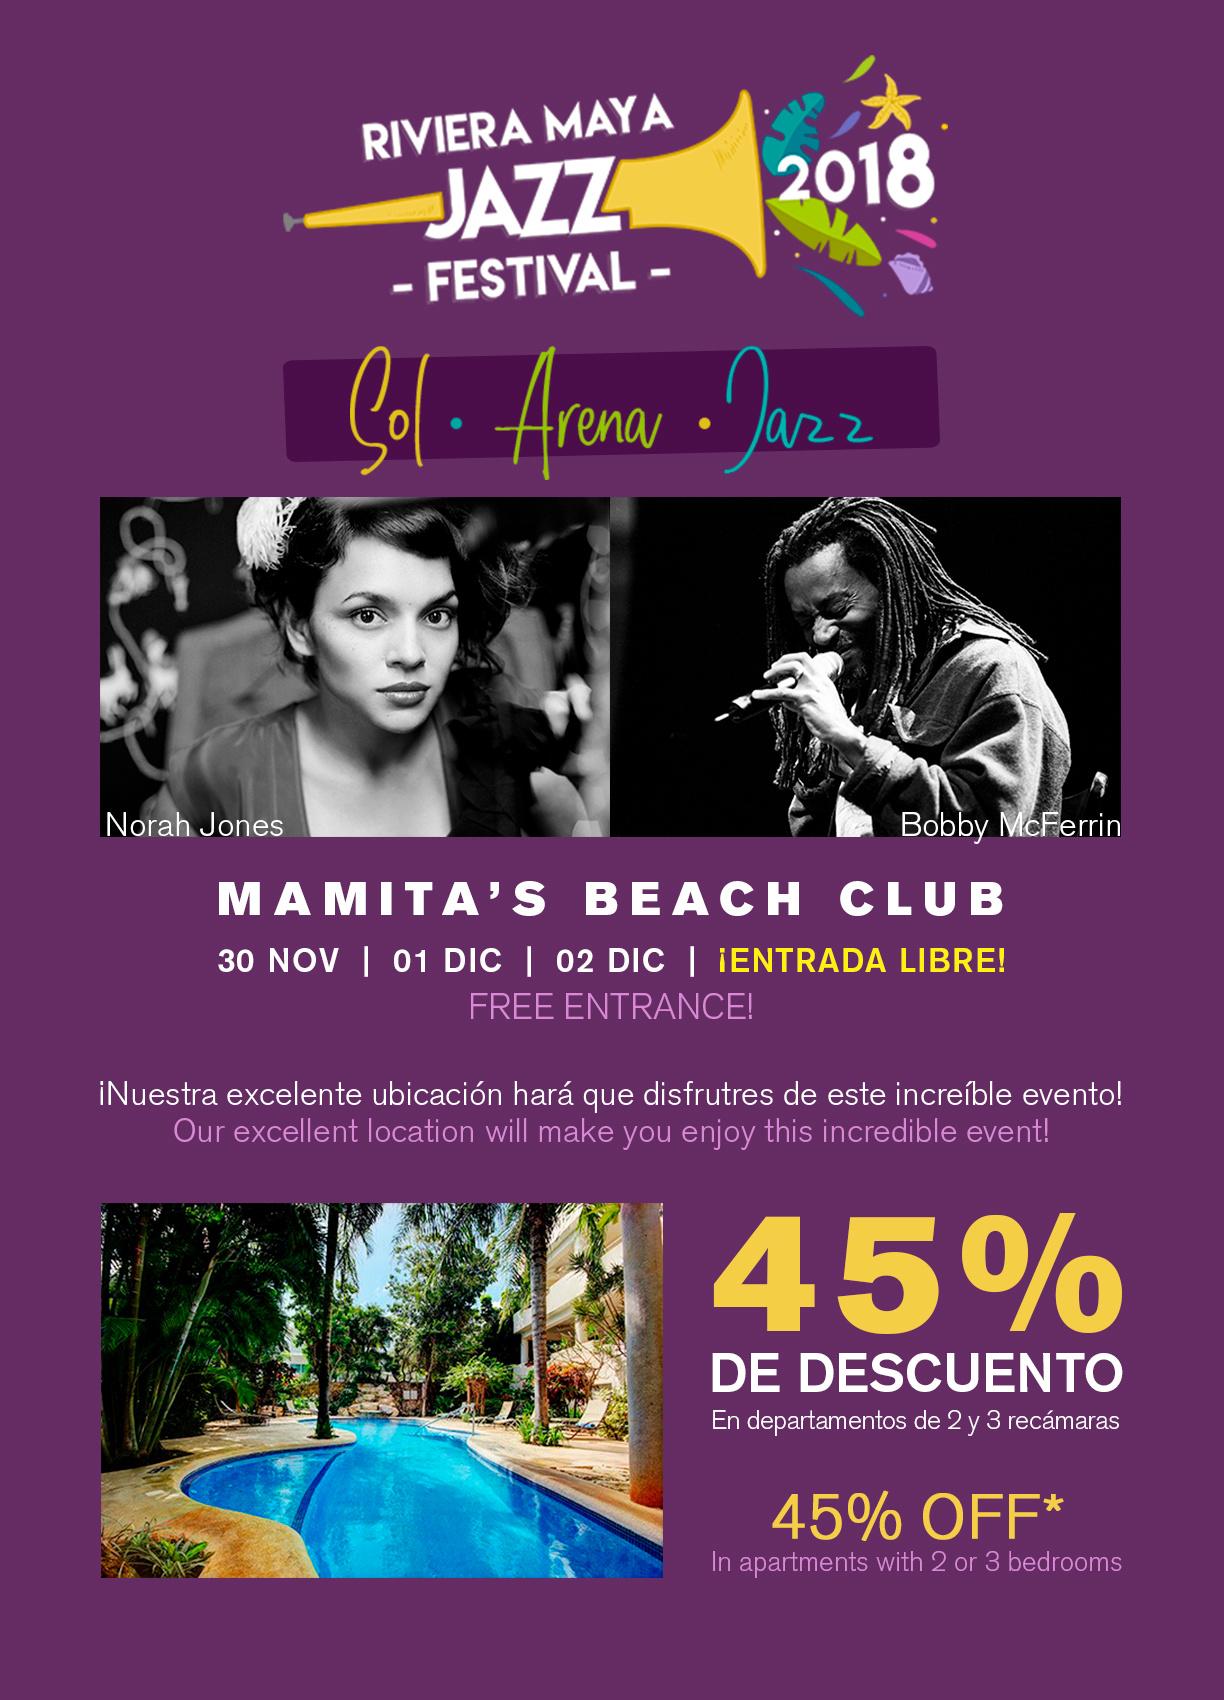 Promo Festival de Jazz 45% de descuento